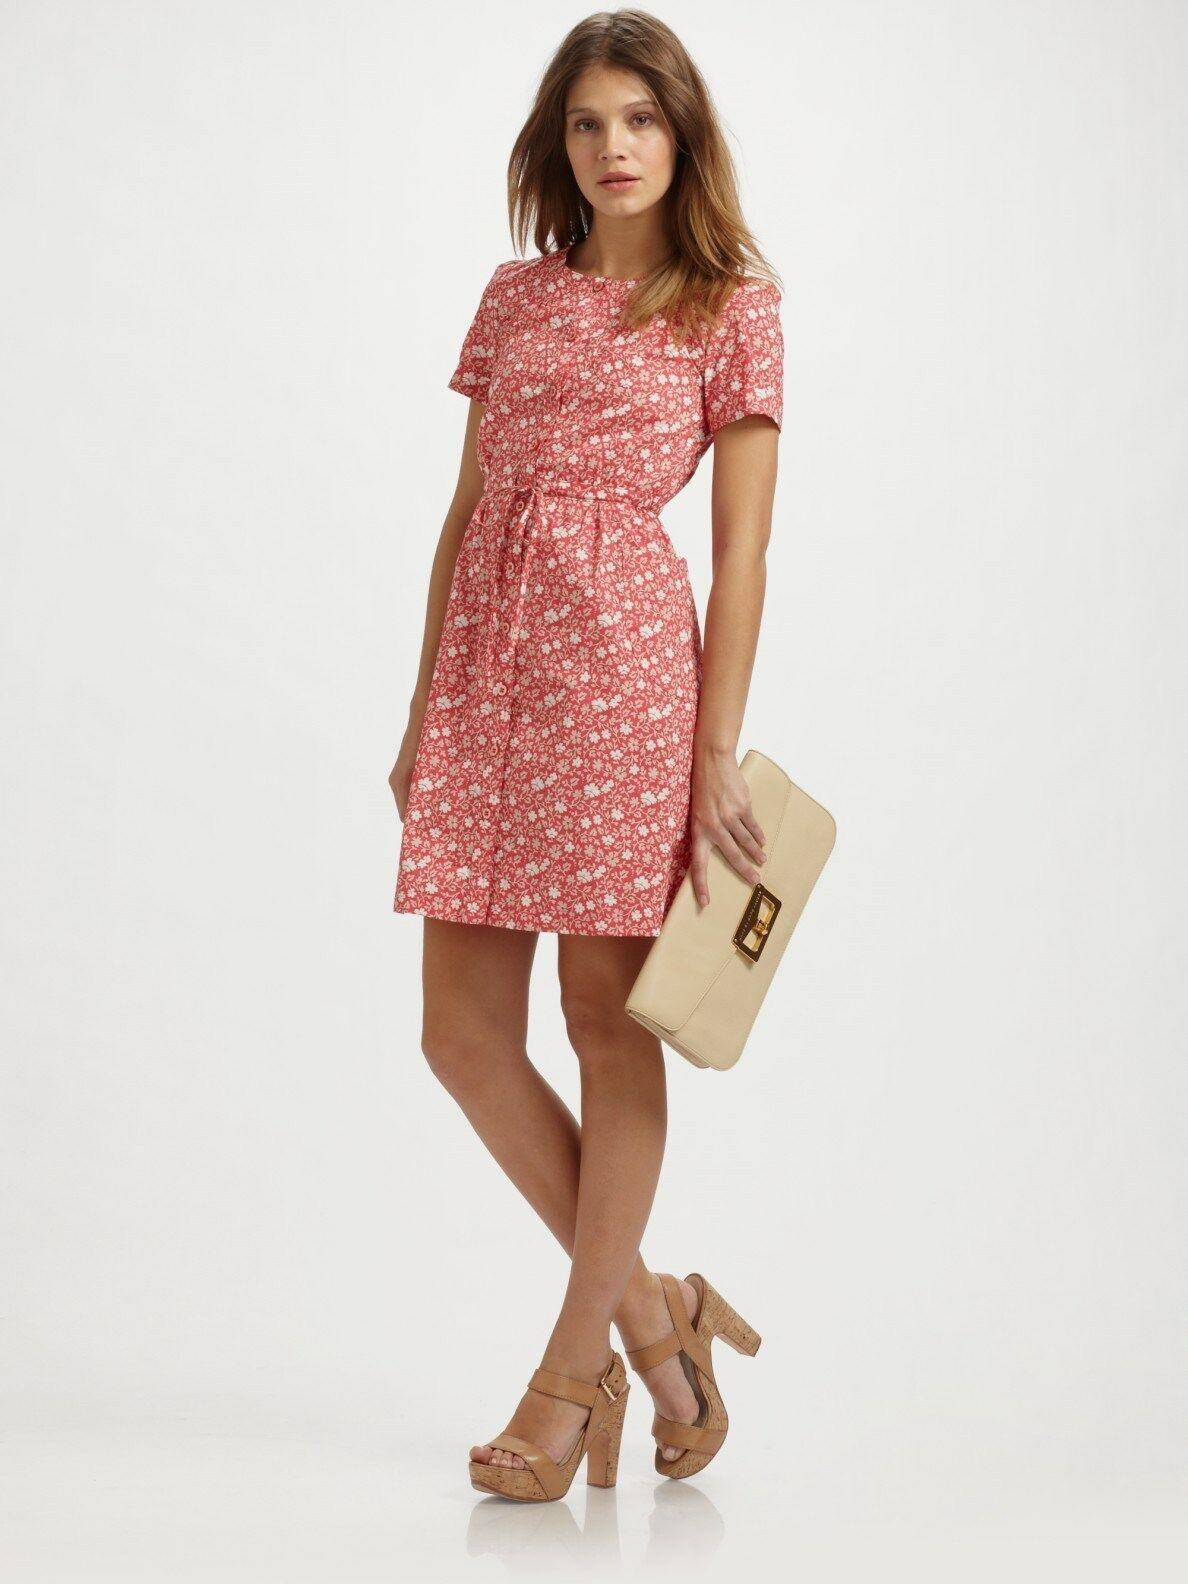 Marc By Marc Jacobs Pink Colette Flower Dress ( Size M)